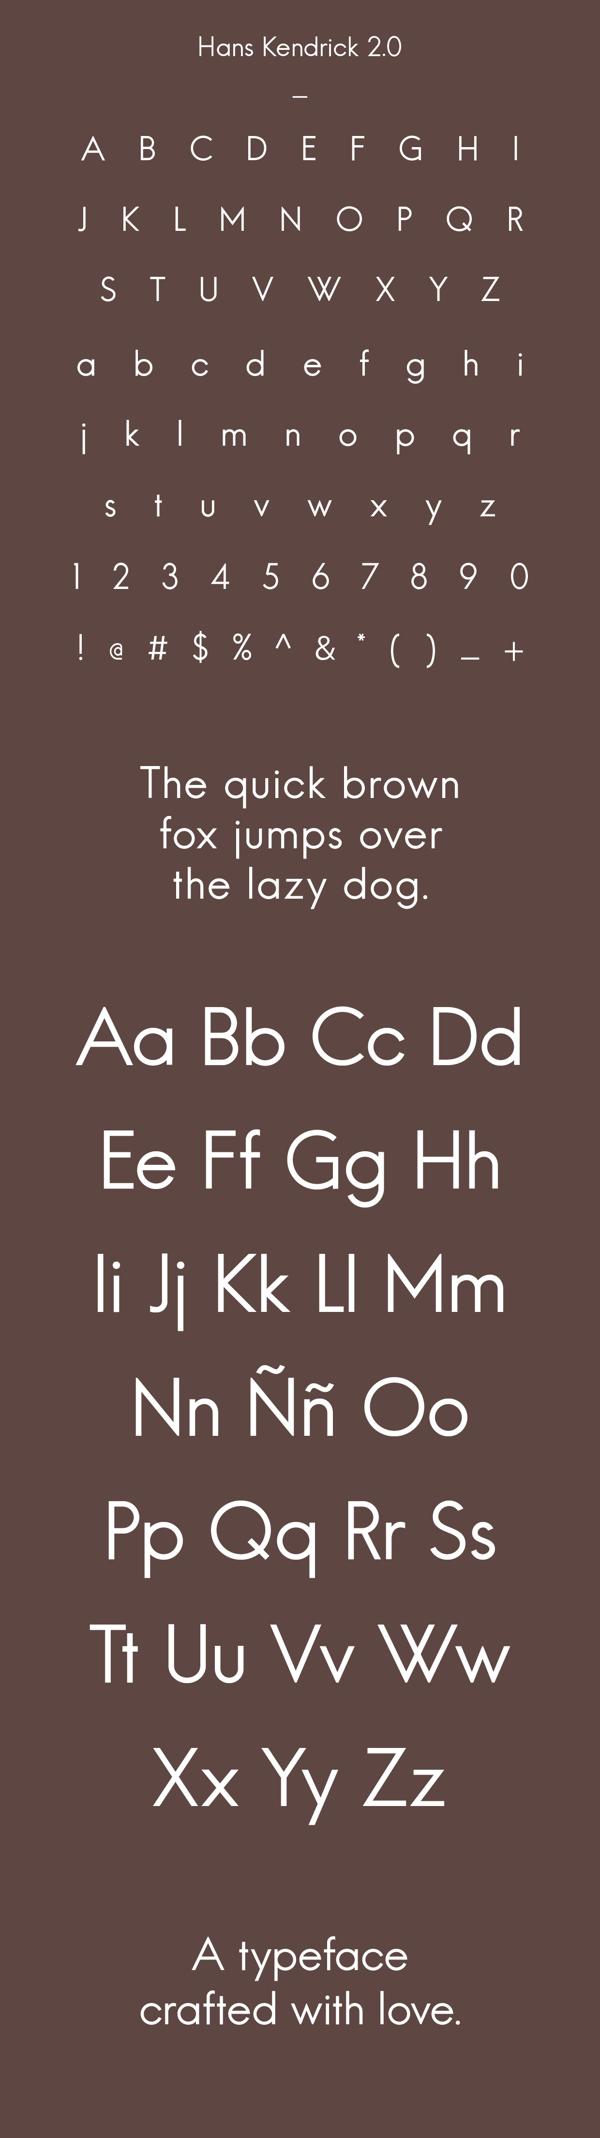 Hans Kendrick Free Typeface V2.0